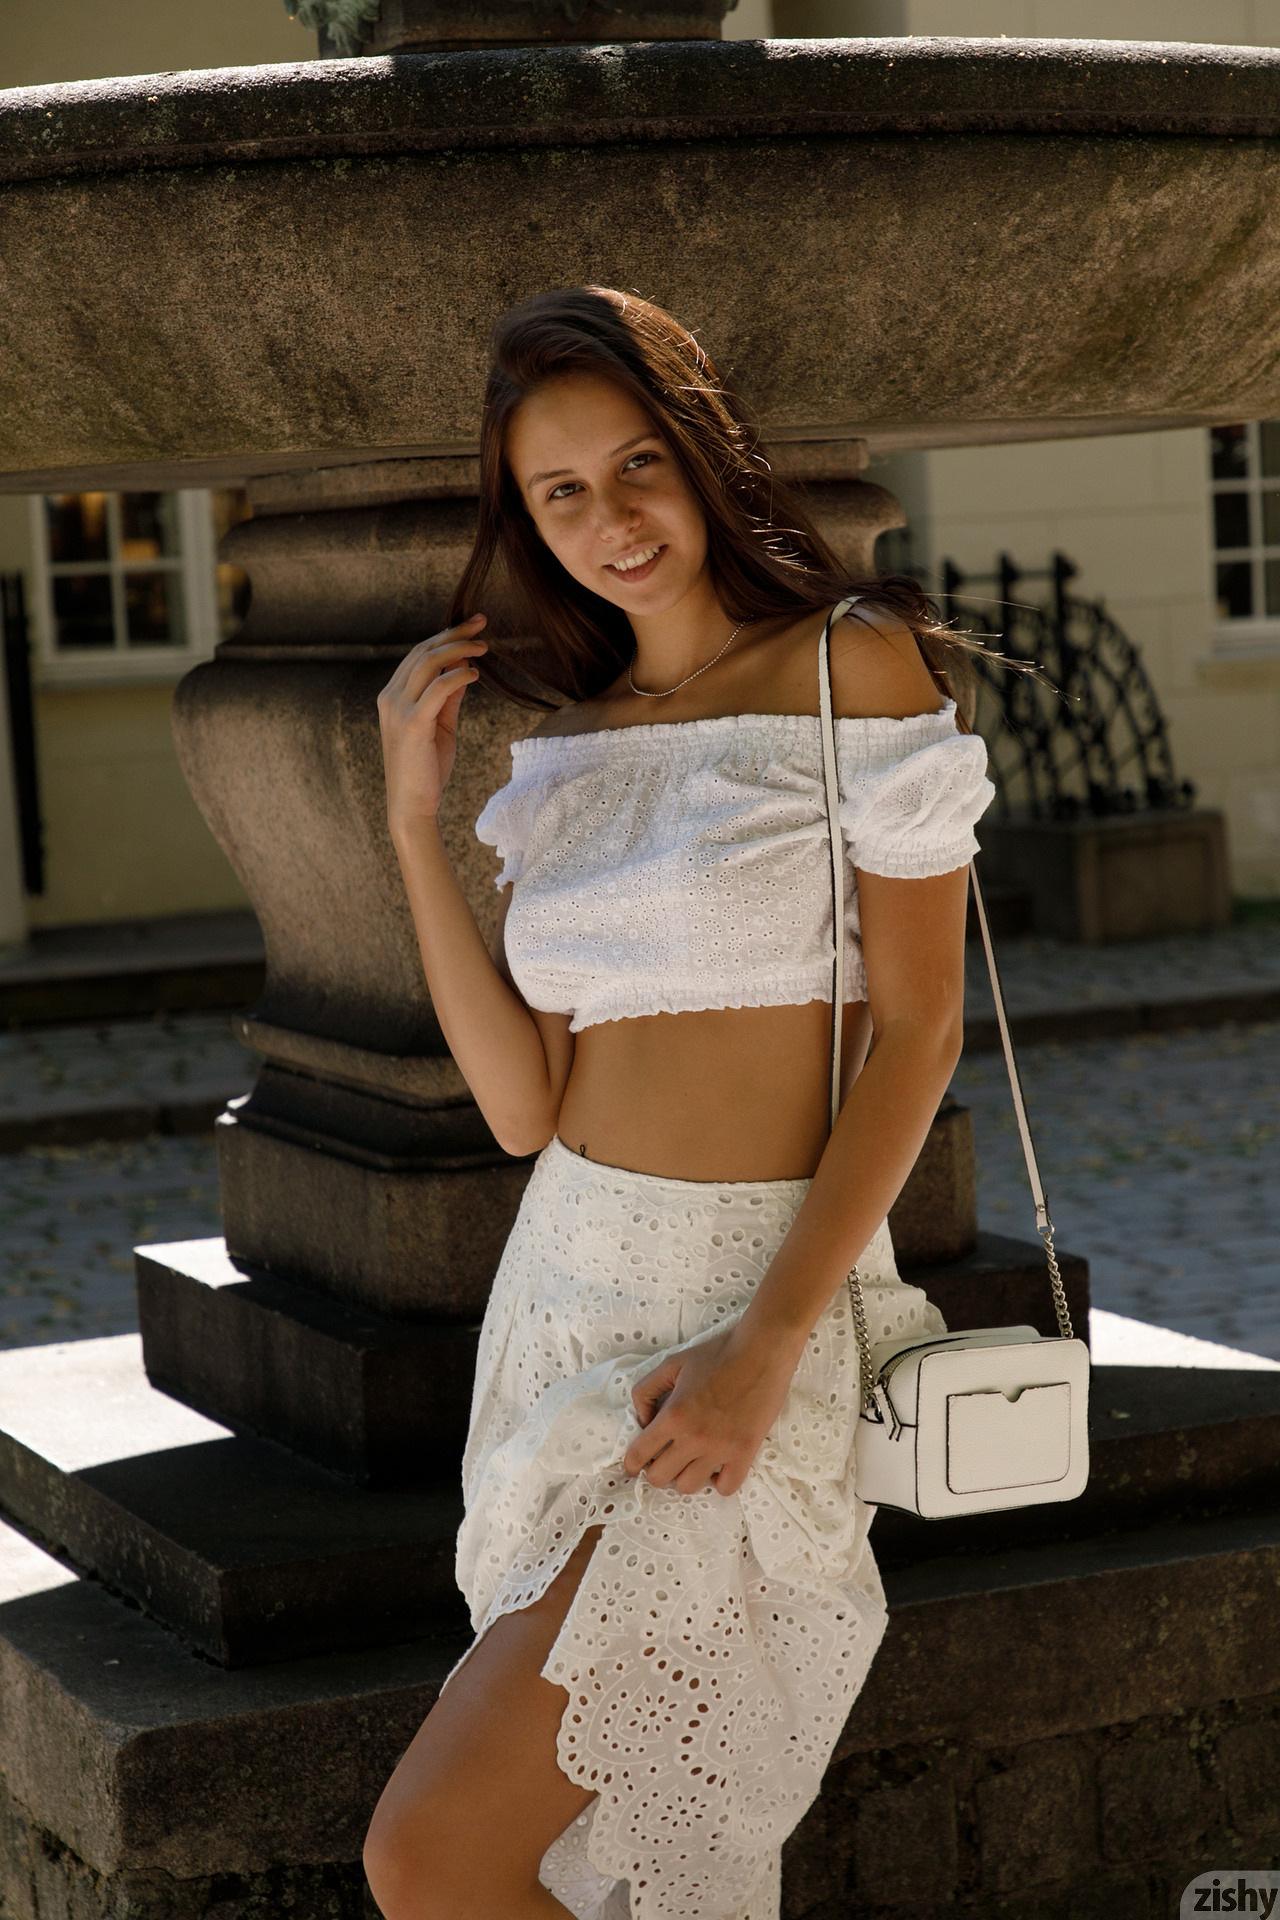 Jessica Albanka Melts Oslo Zishy (6)